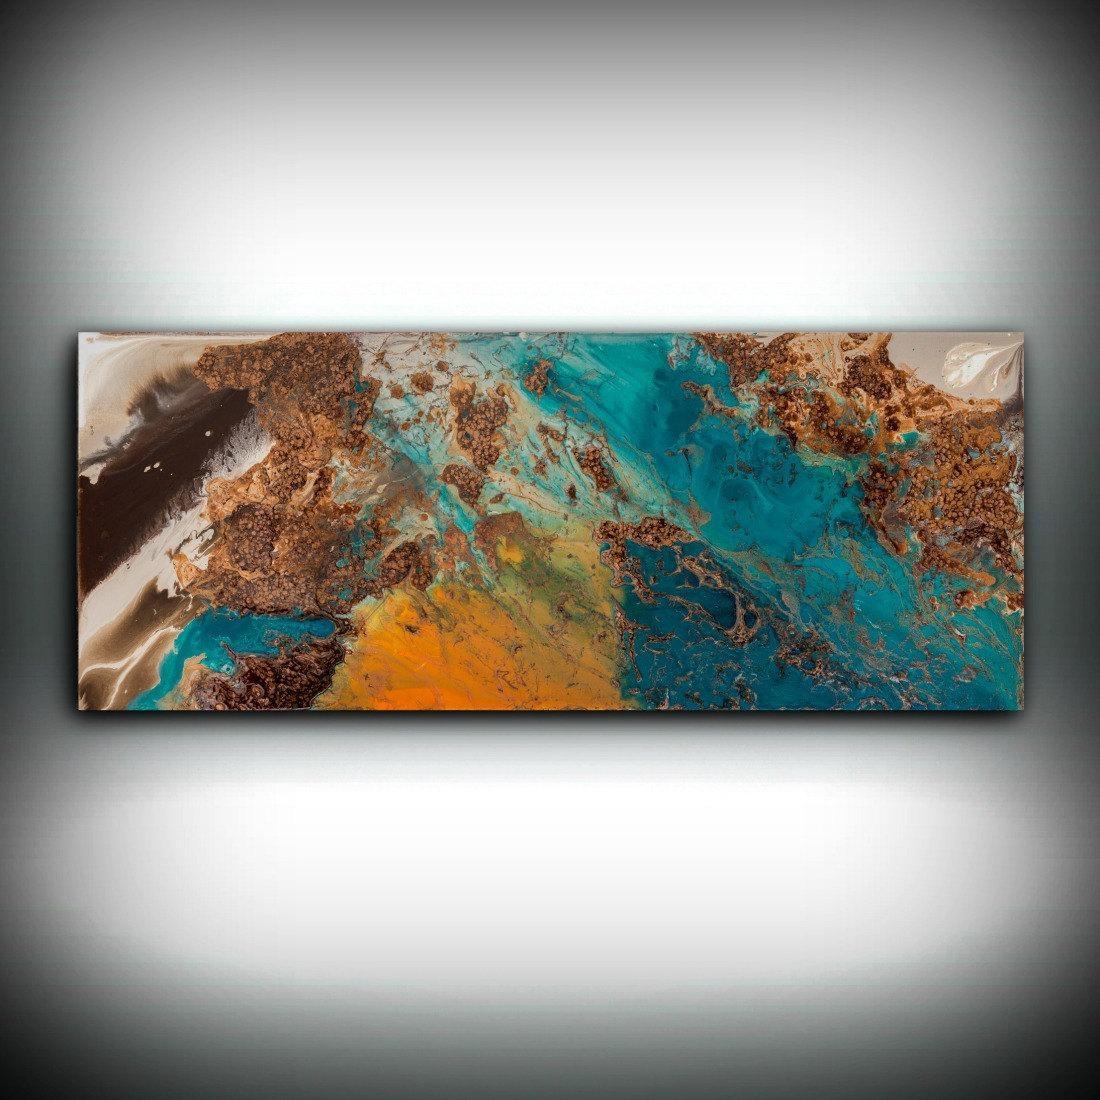 Wall Art Designs: Amazing Wall Art Sale Framed On Sale Art In Modern Wall Art For Sale (View 3 of 20)